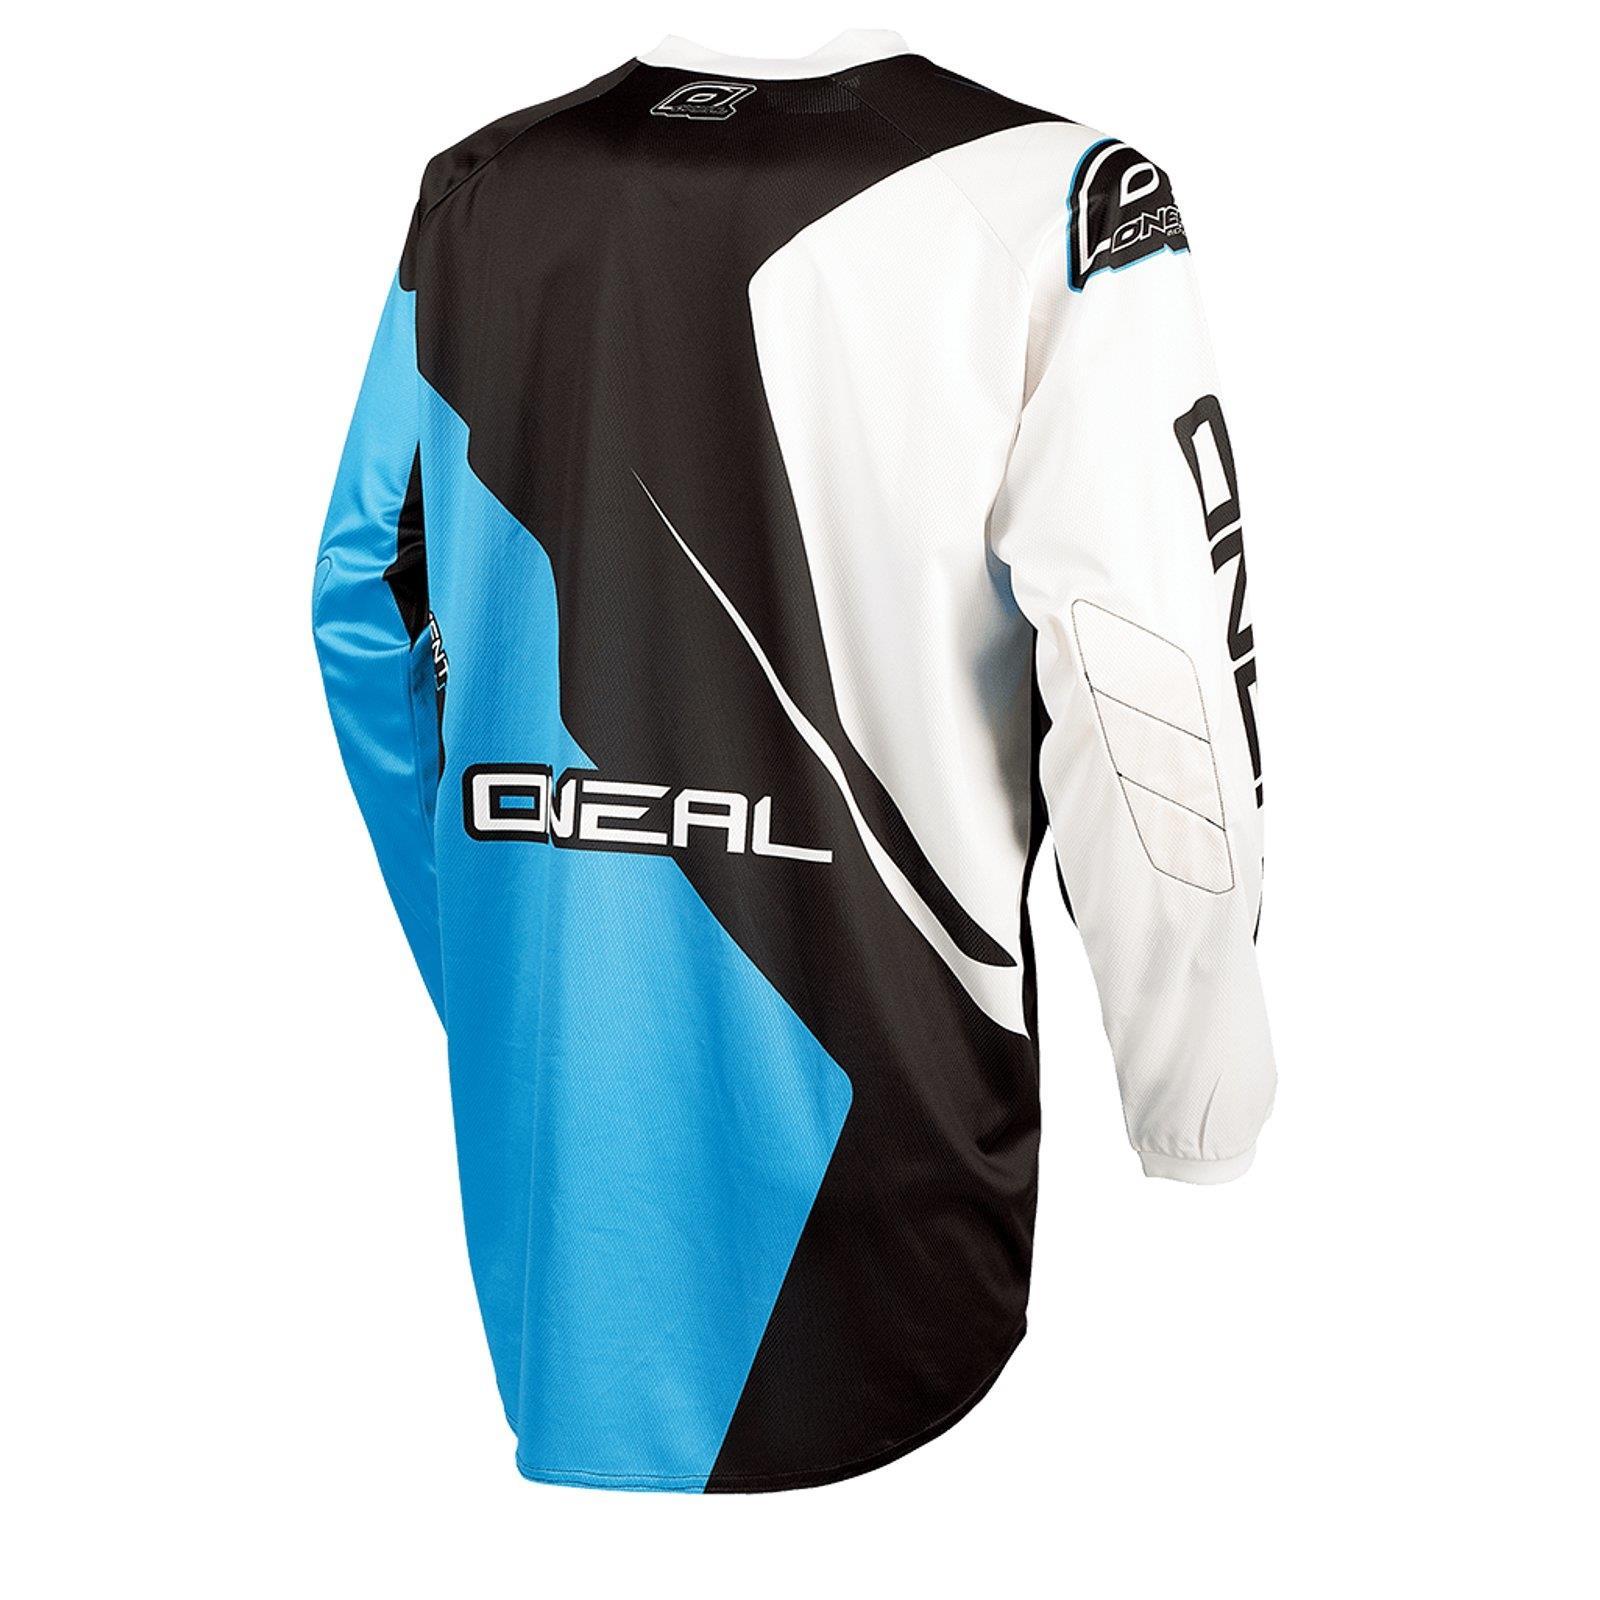 O-039-Neal-Element-Racewear-Jersey-Motocross-MX-Enduro-DH-FR-Mountain-Bike-MTB-BMX miniatura 18